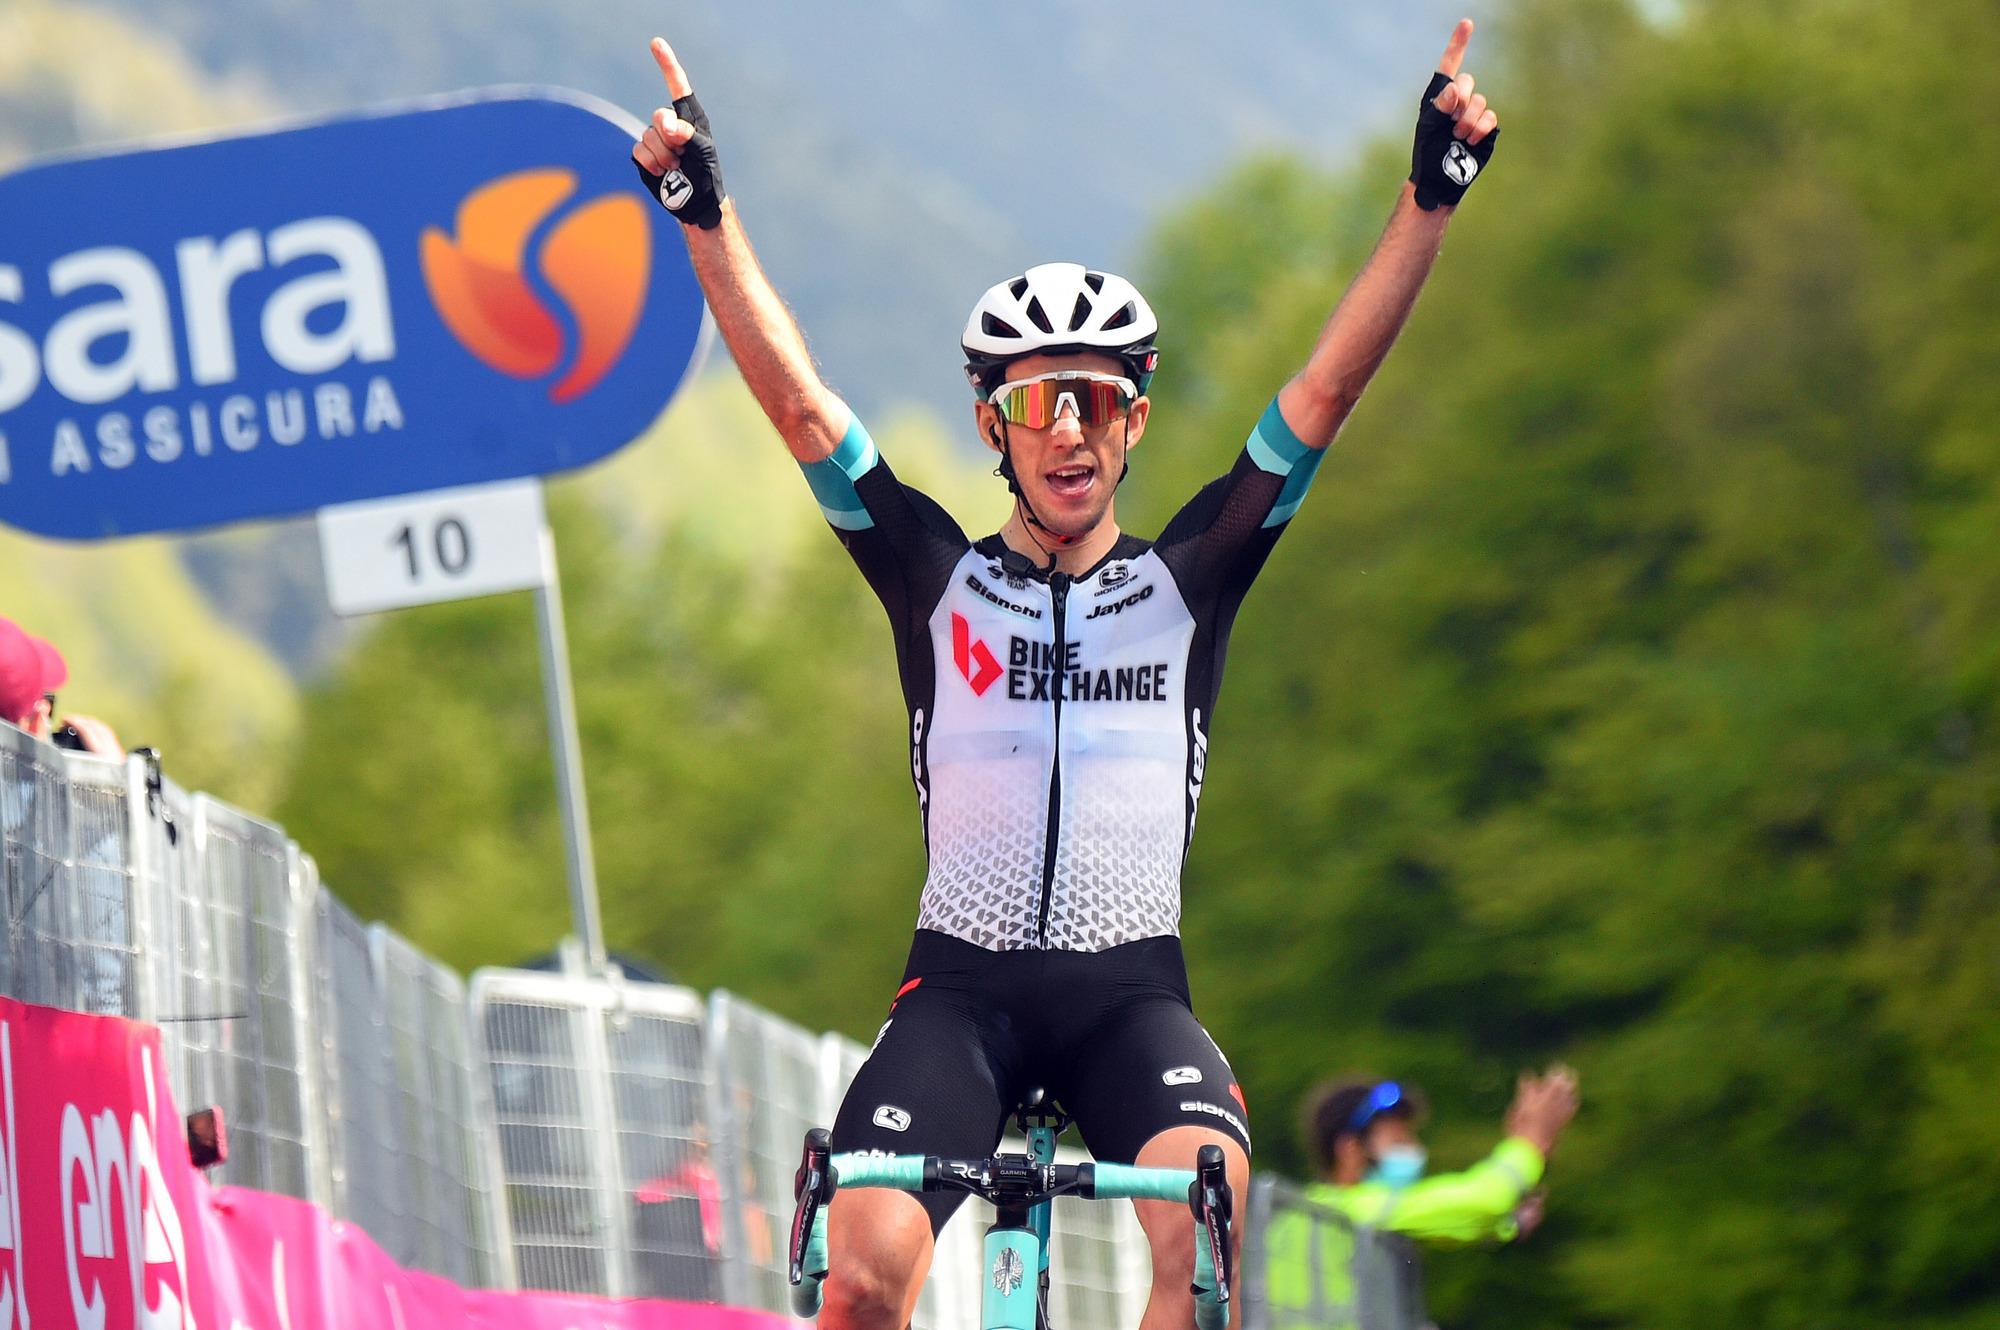 Giro d'Italia 2021 - 104th Edition - 19th stage Abbiategrasso - Alpe di Mera 166 km - 28/05/2021 - Simon Yates (GBR - Team Bikeexchange) - photo Luca Bettini/BettiniPhoto©2021